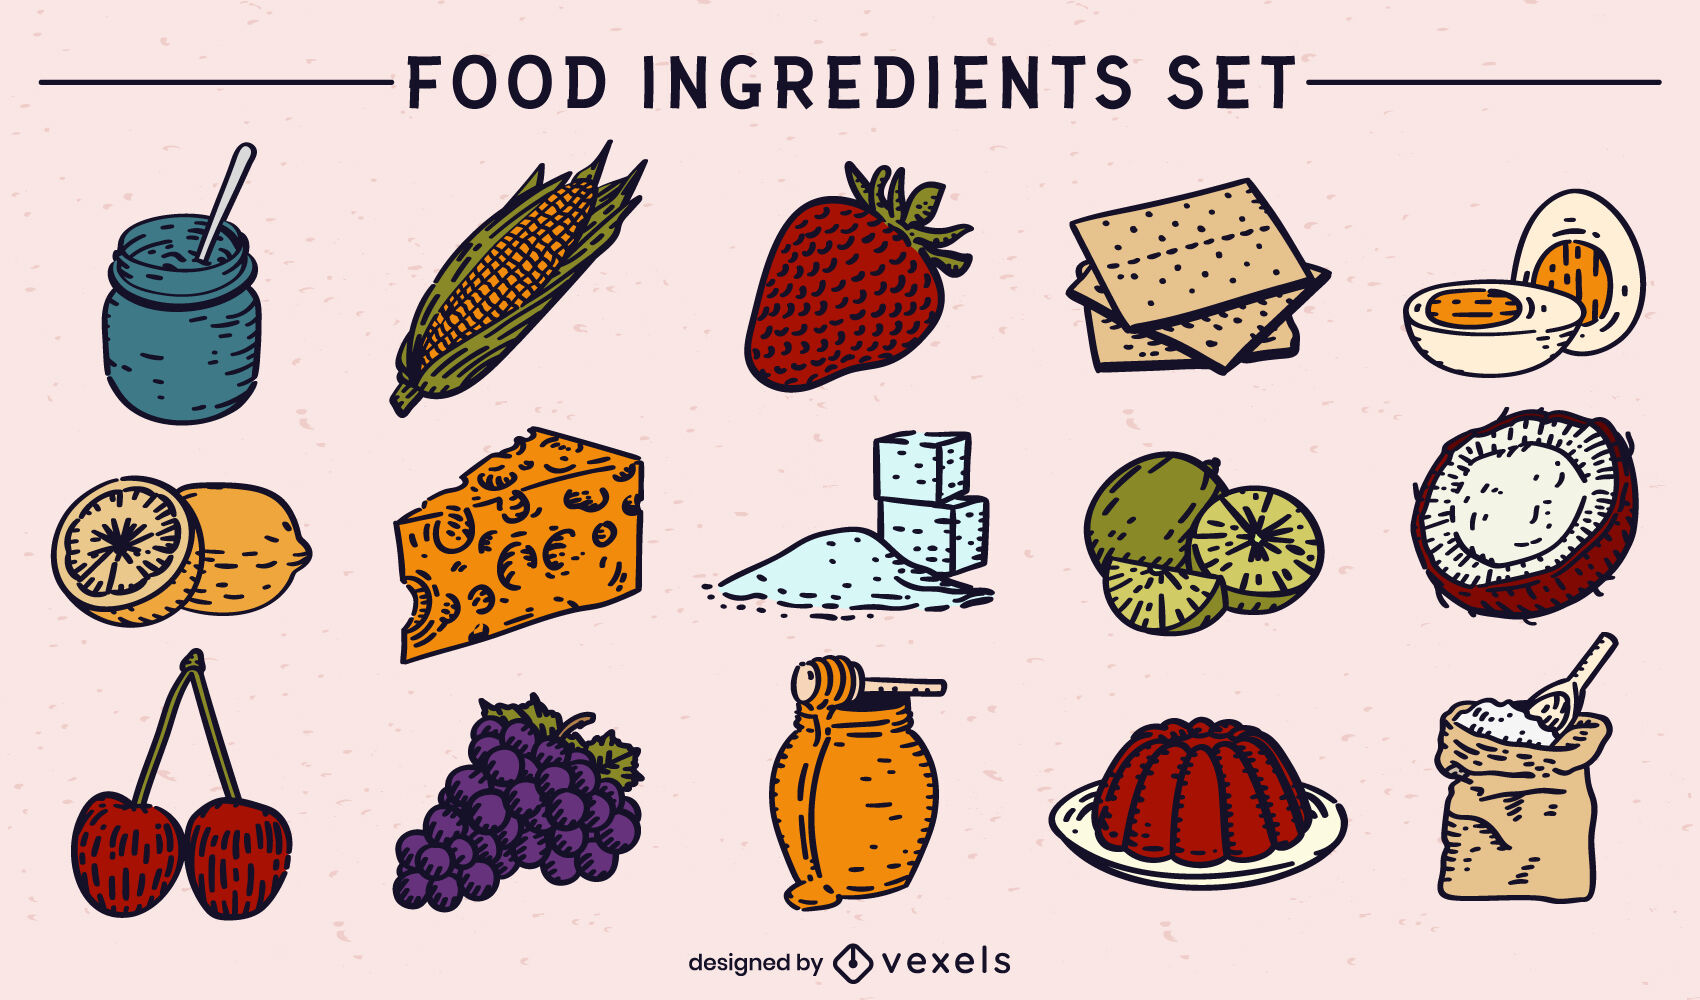 Food elements and ingredients set